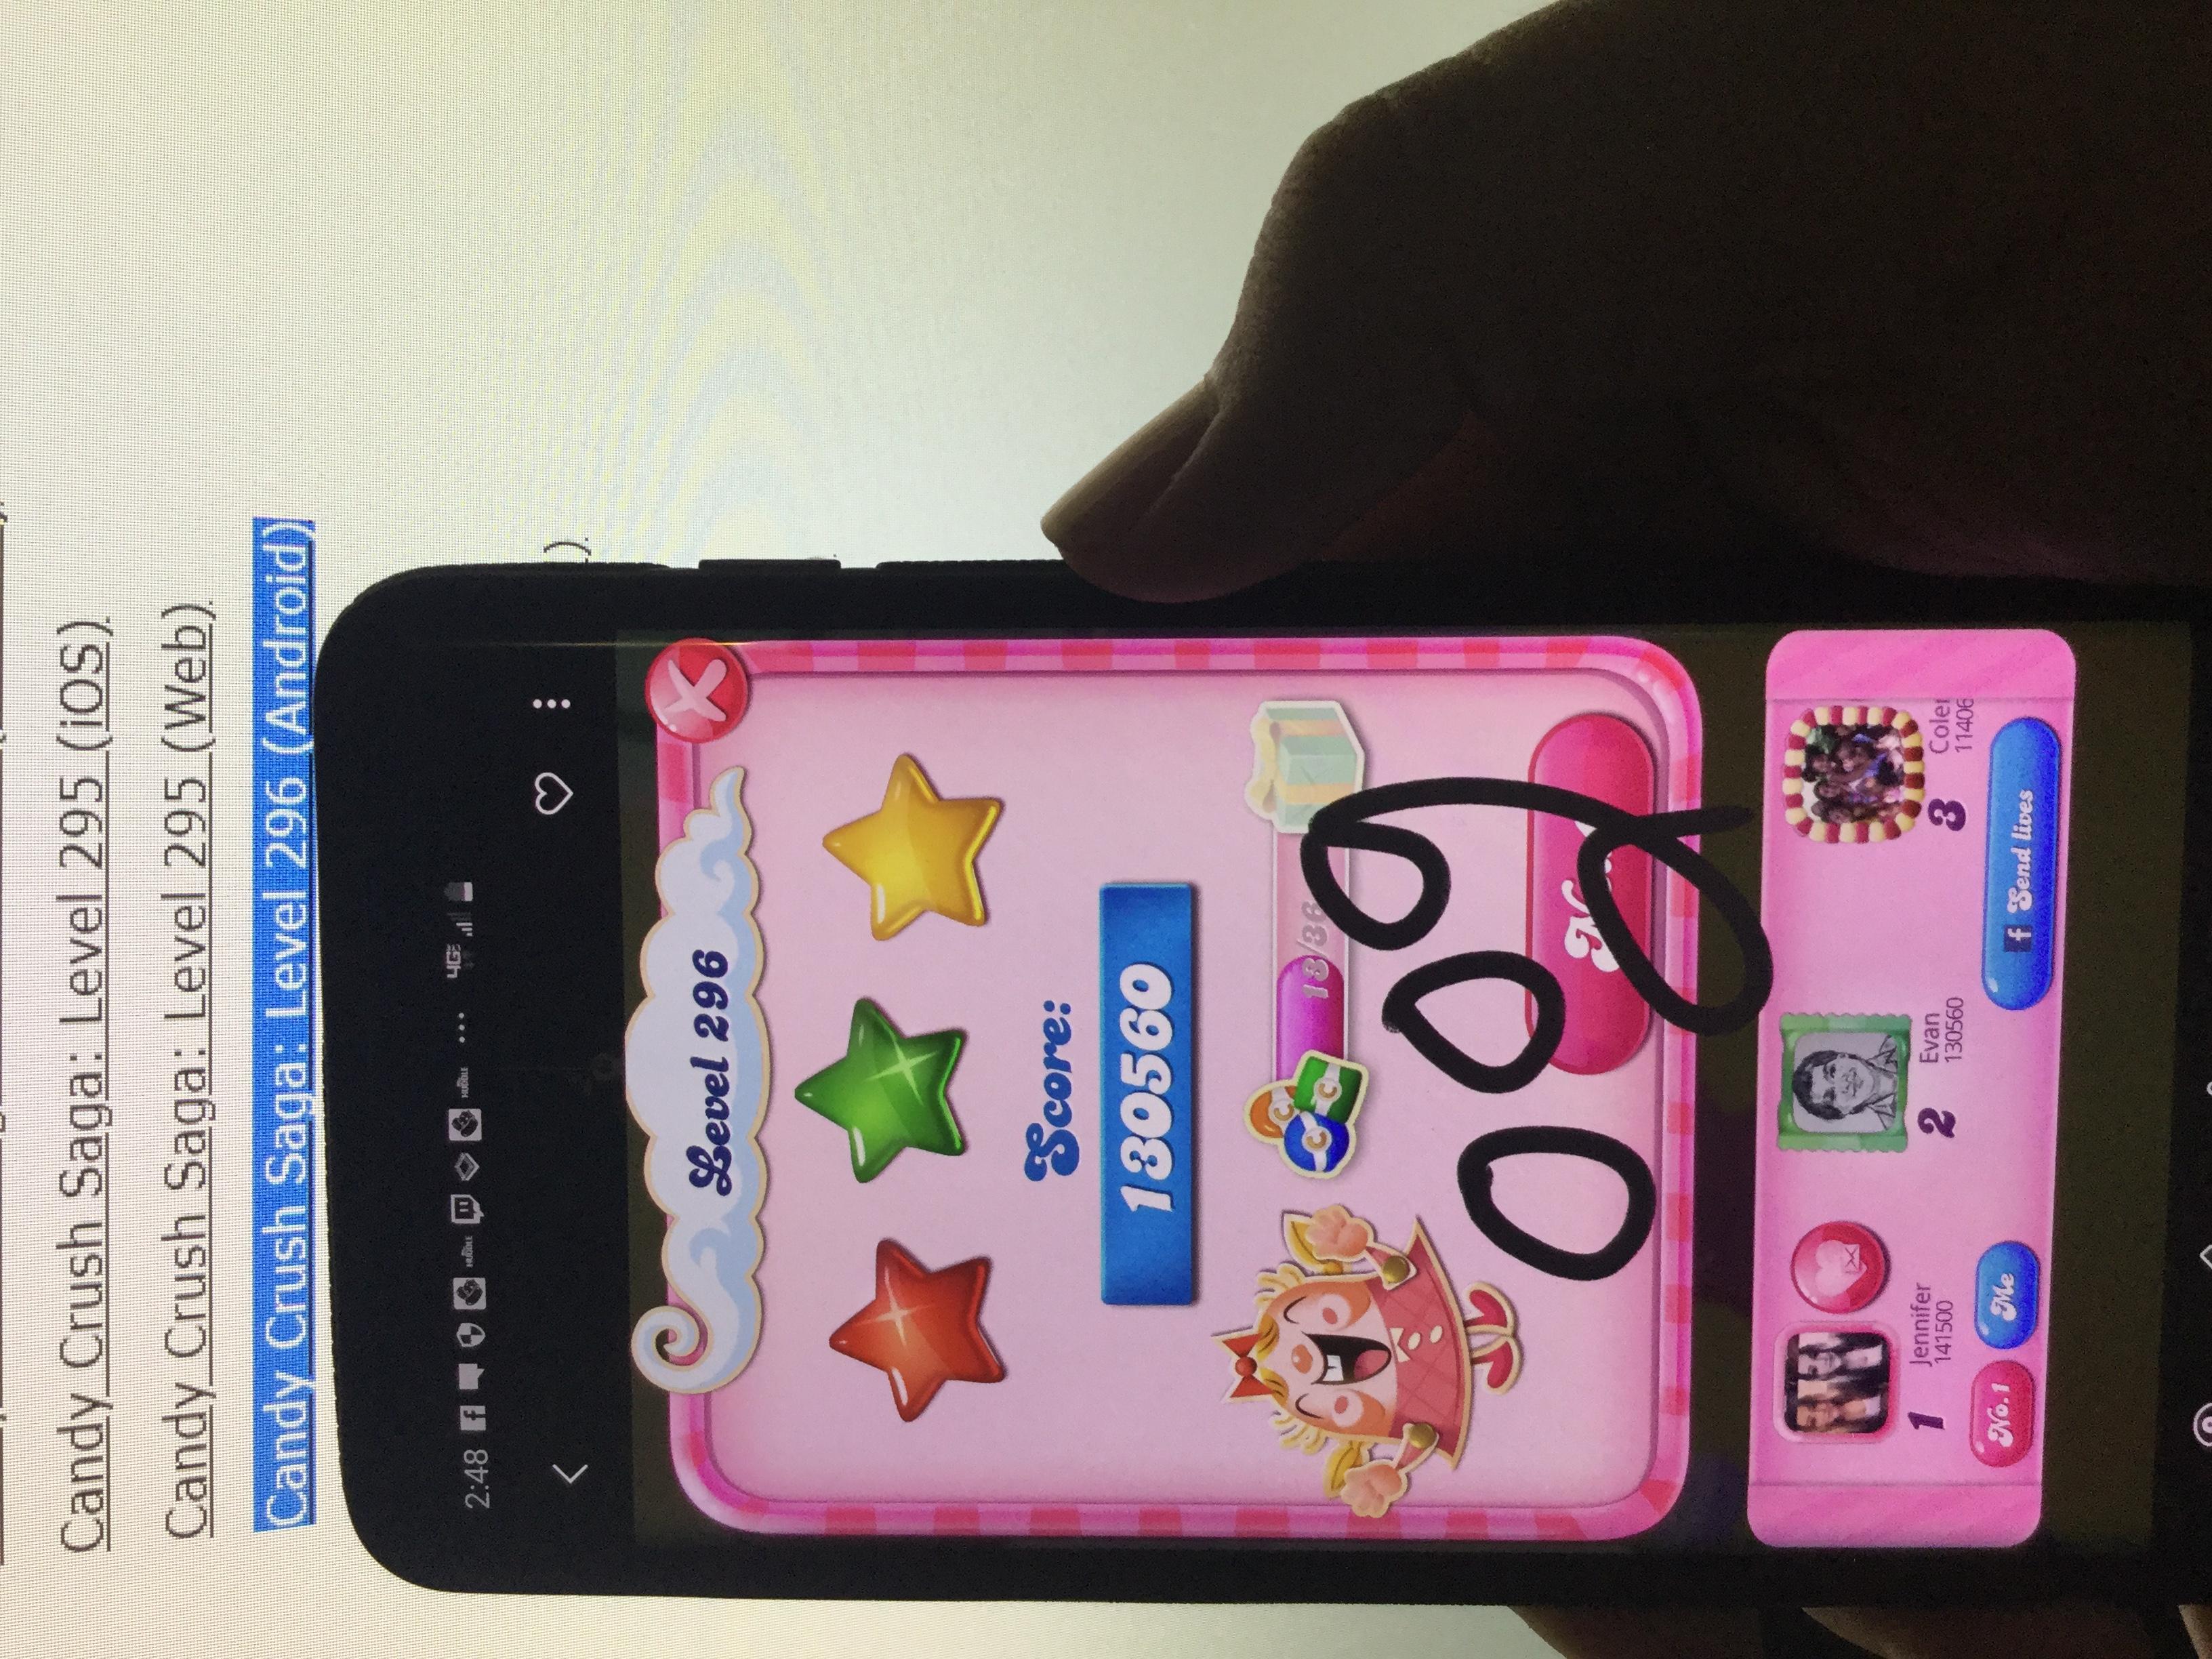 Candy Crush Saga: Level 296 130,560 points